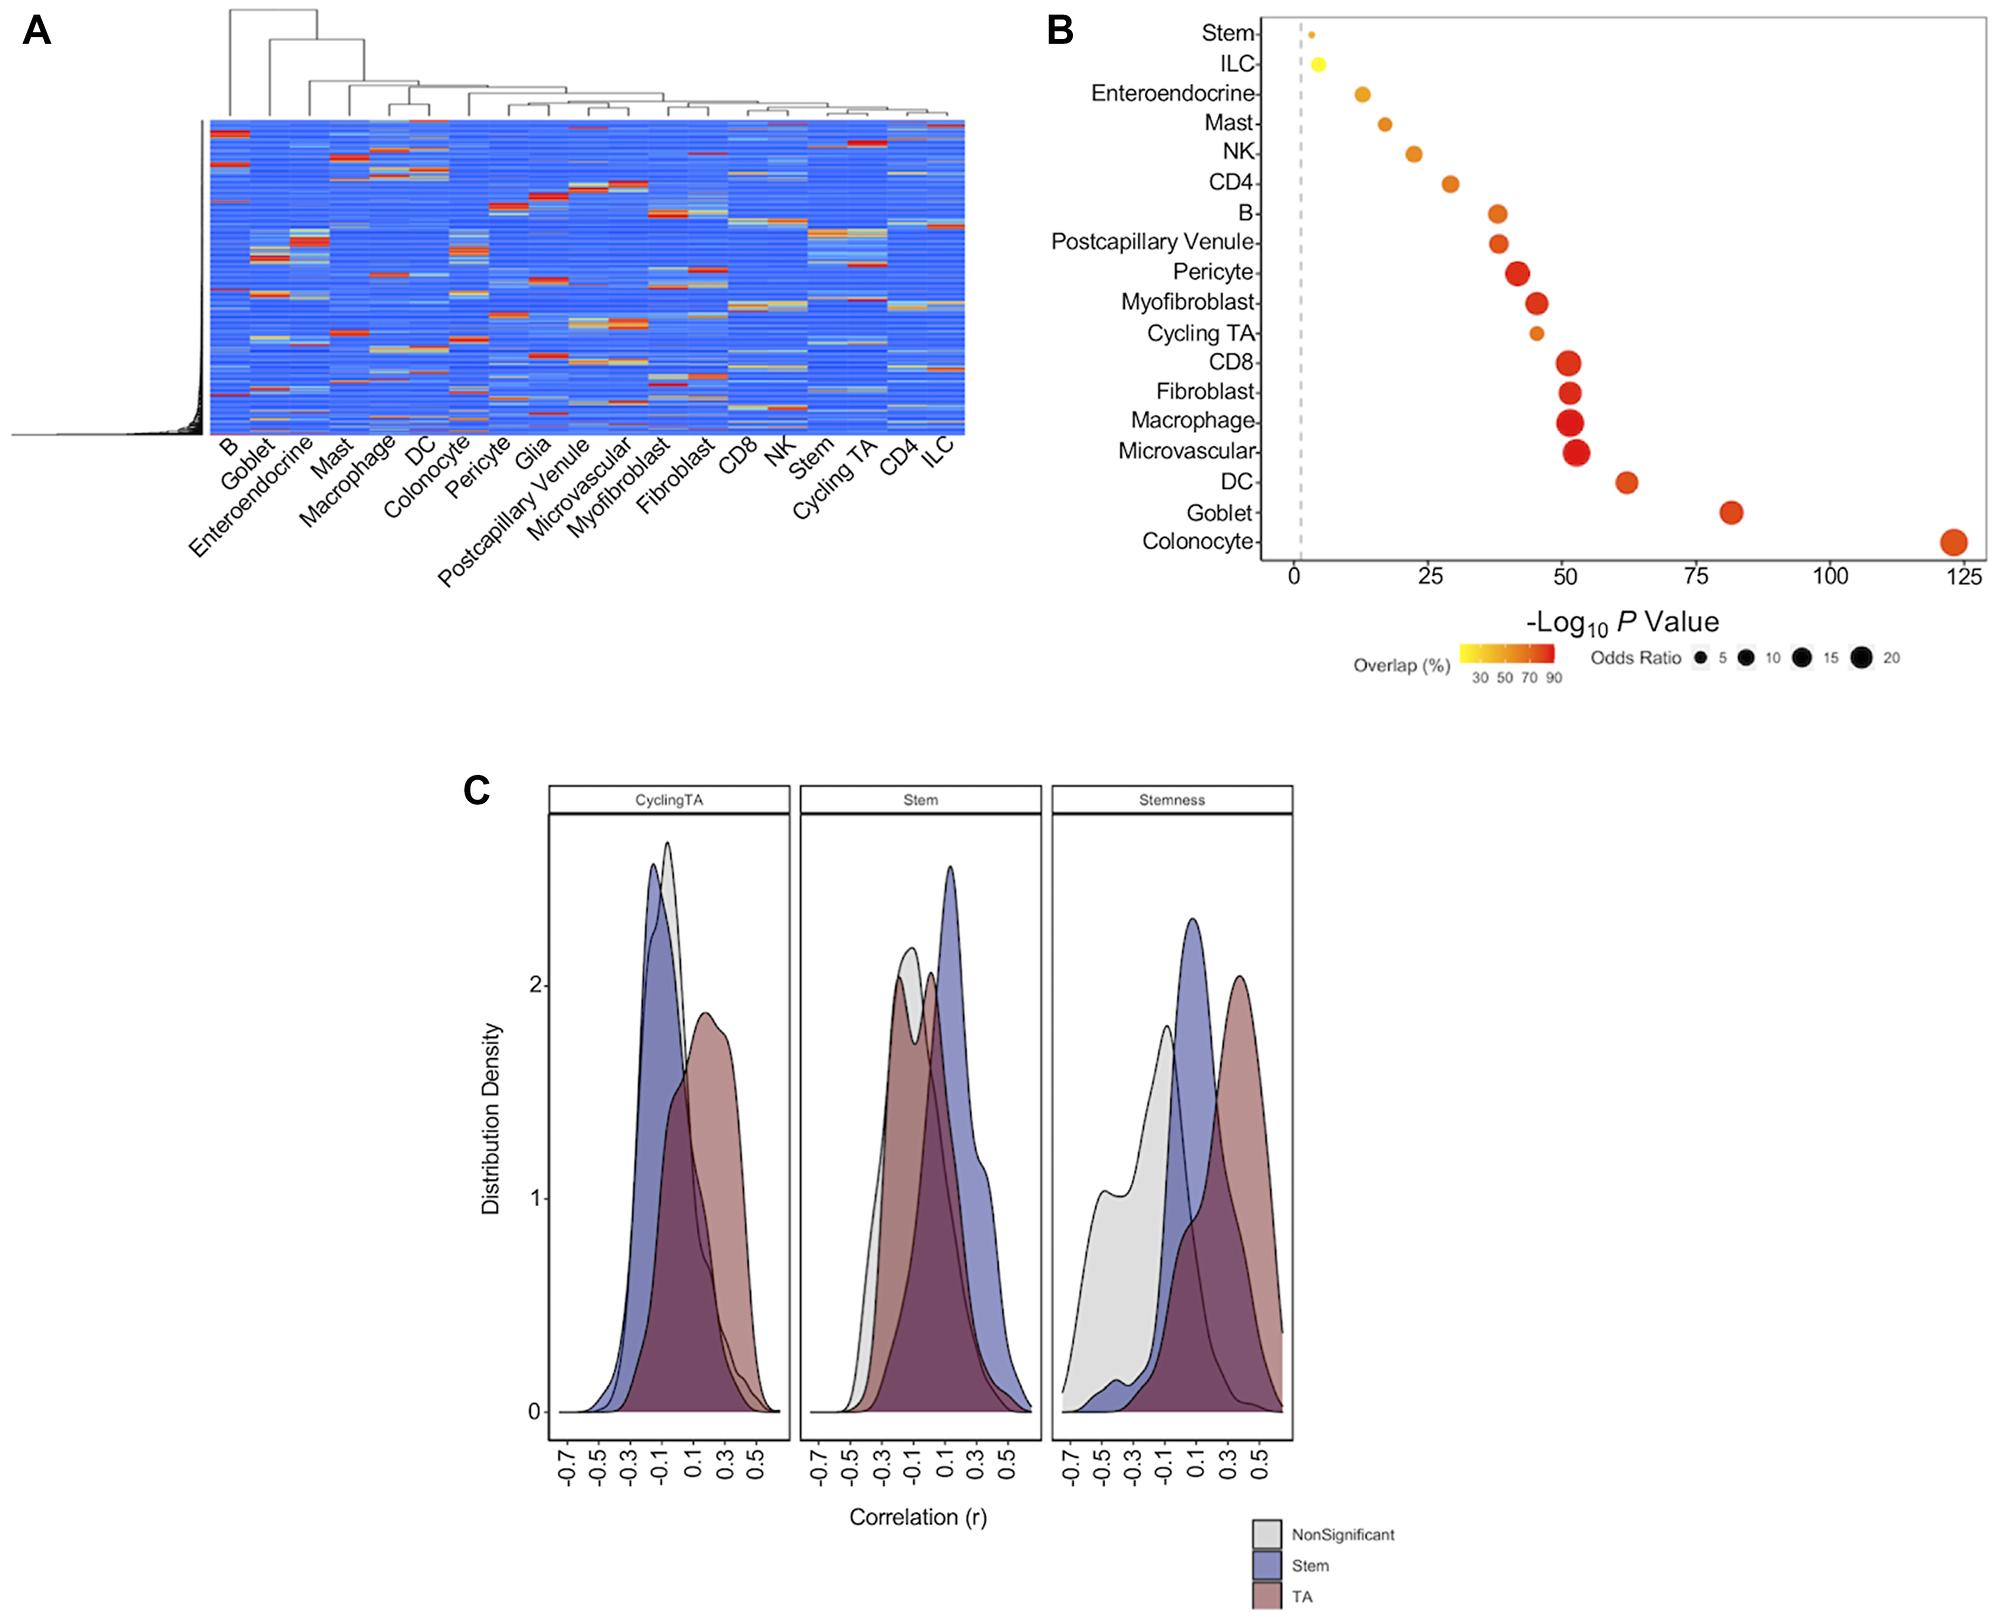 Single cell deconvolution of bulk RNA-seq datasets.